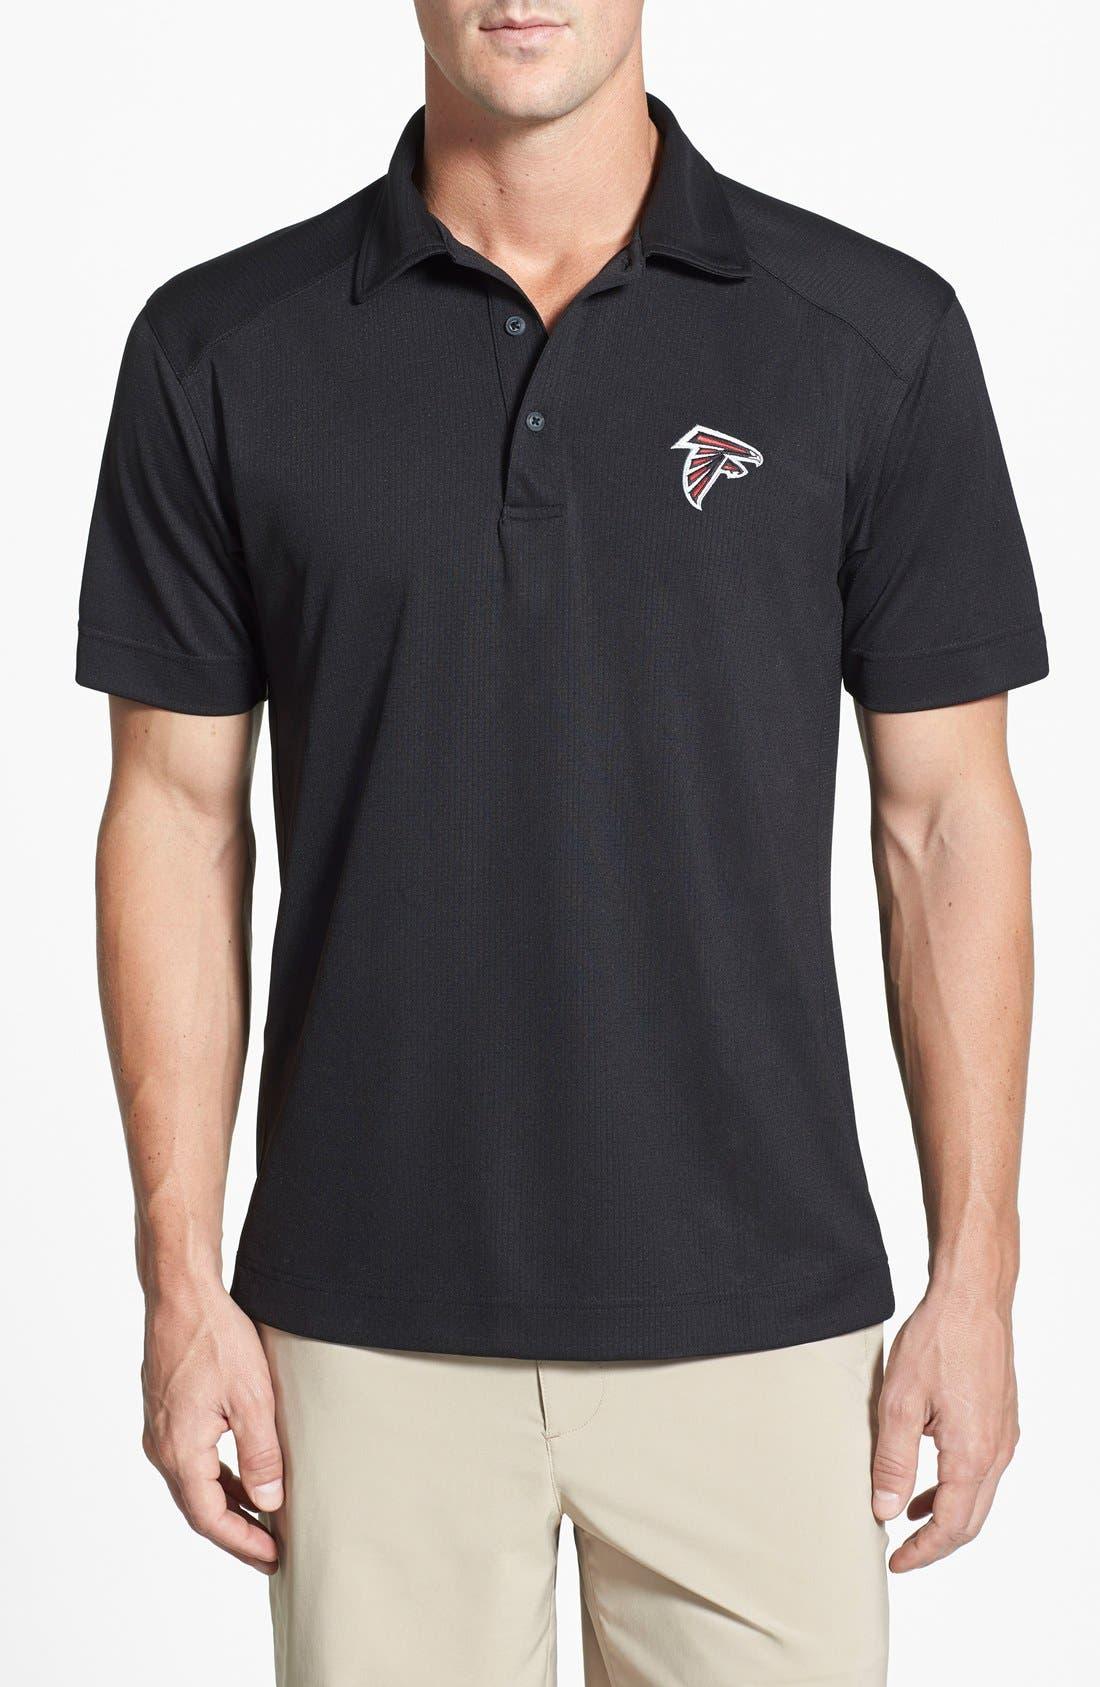 Atlanta Falcons - Genre DryTec Moisture Wicking Polo,                             Main thumbnail 1, color,                             Black